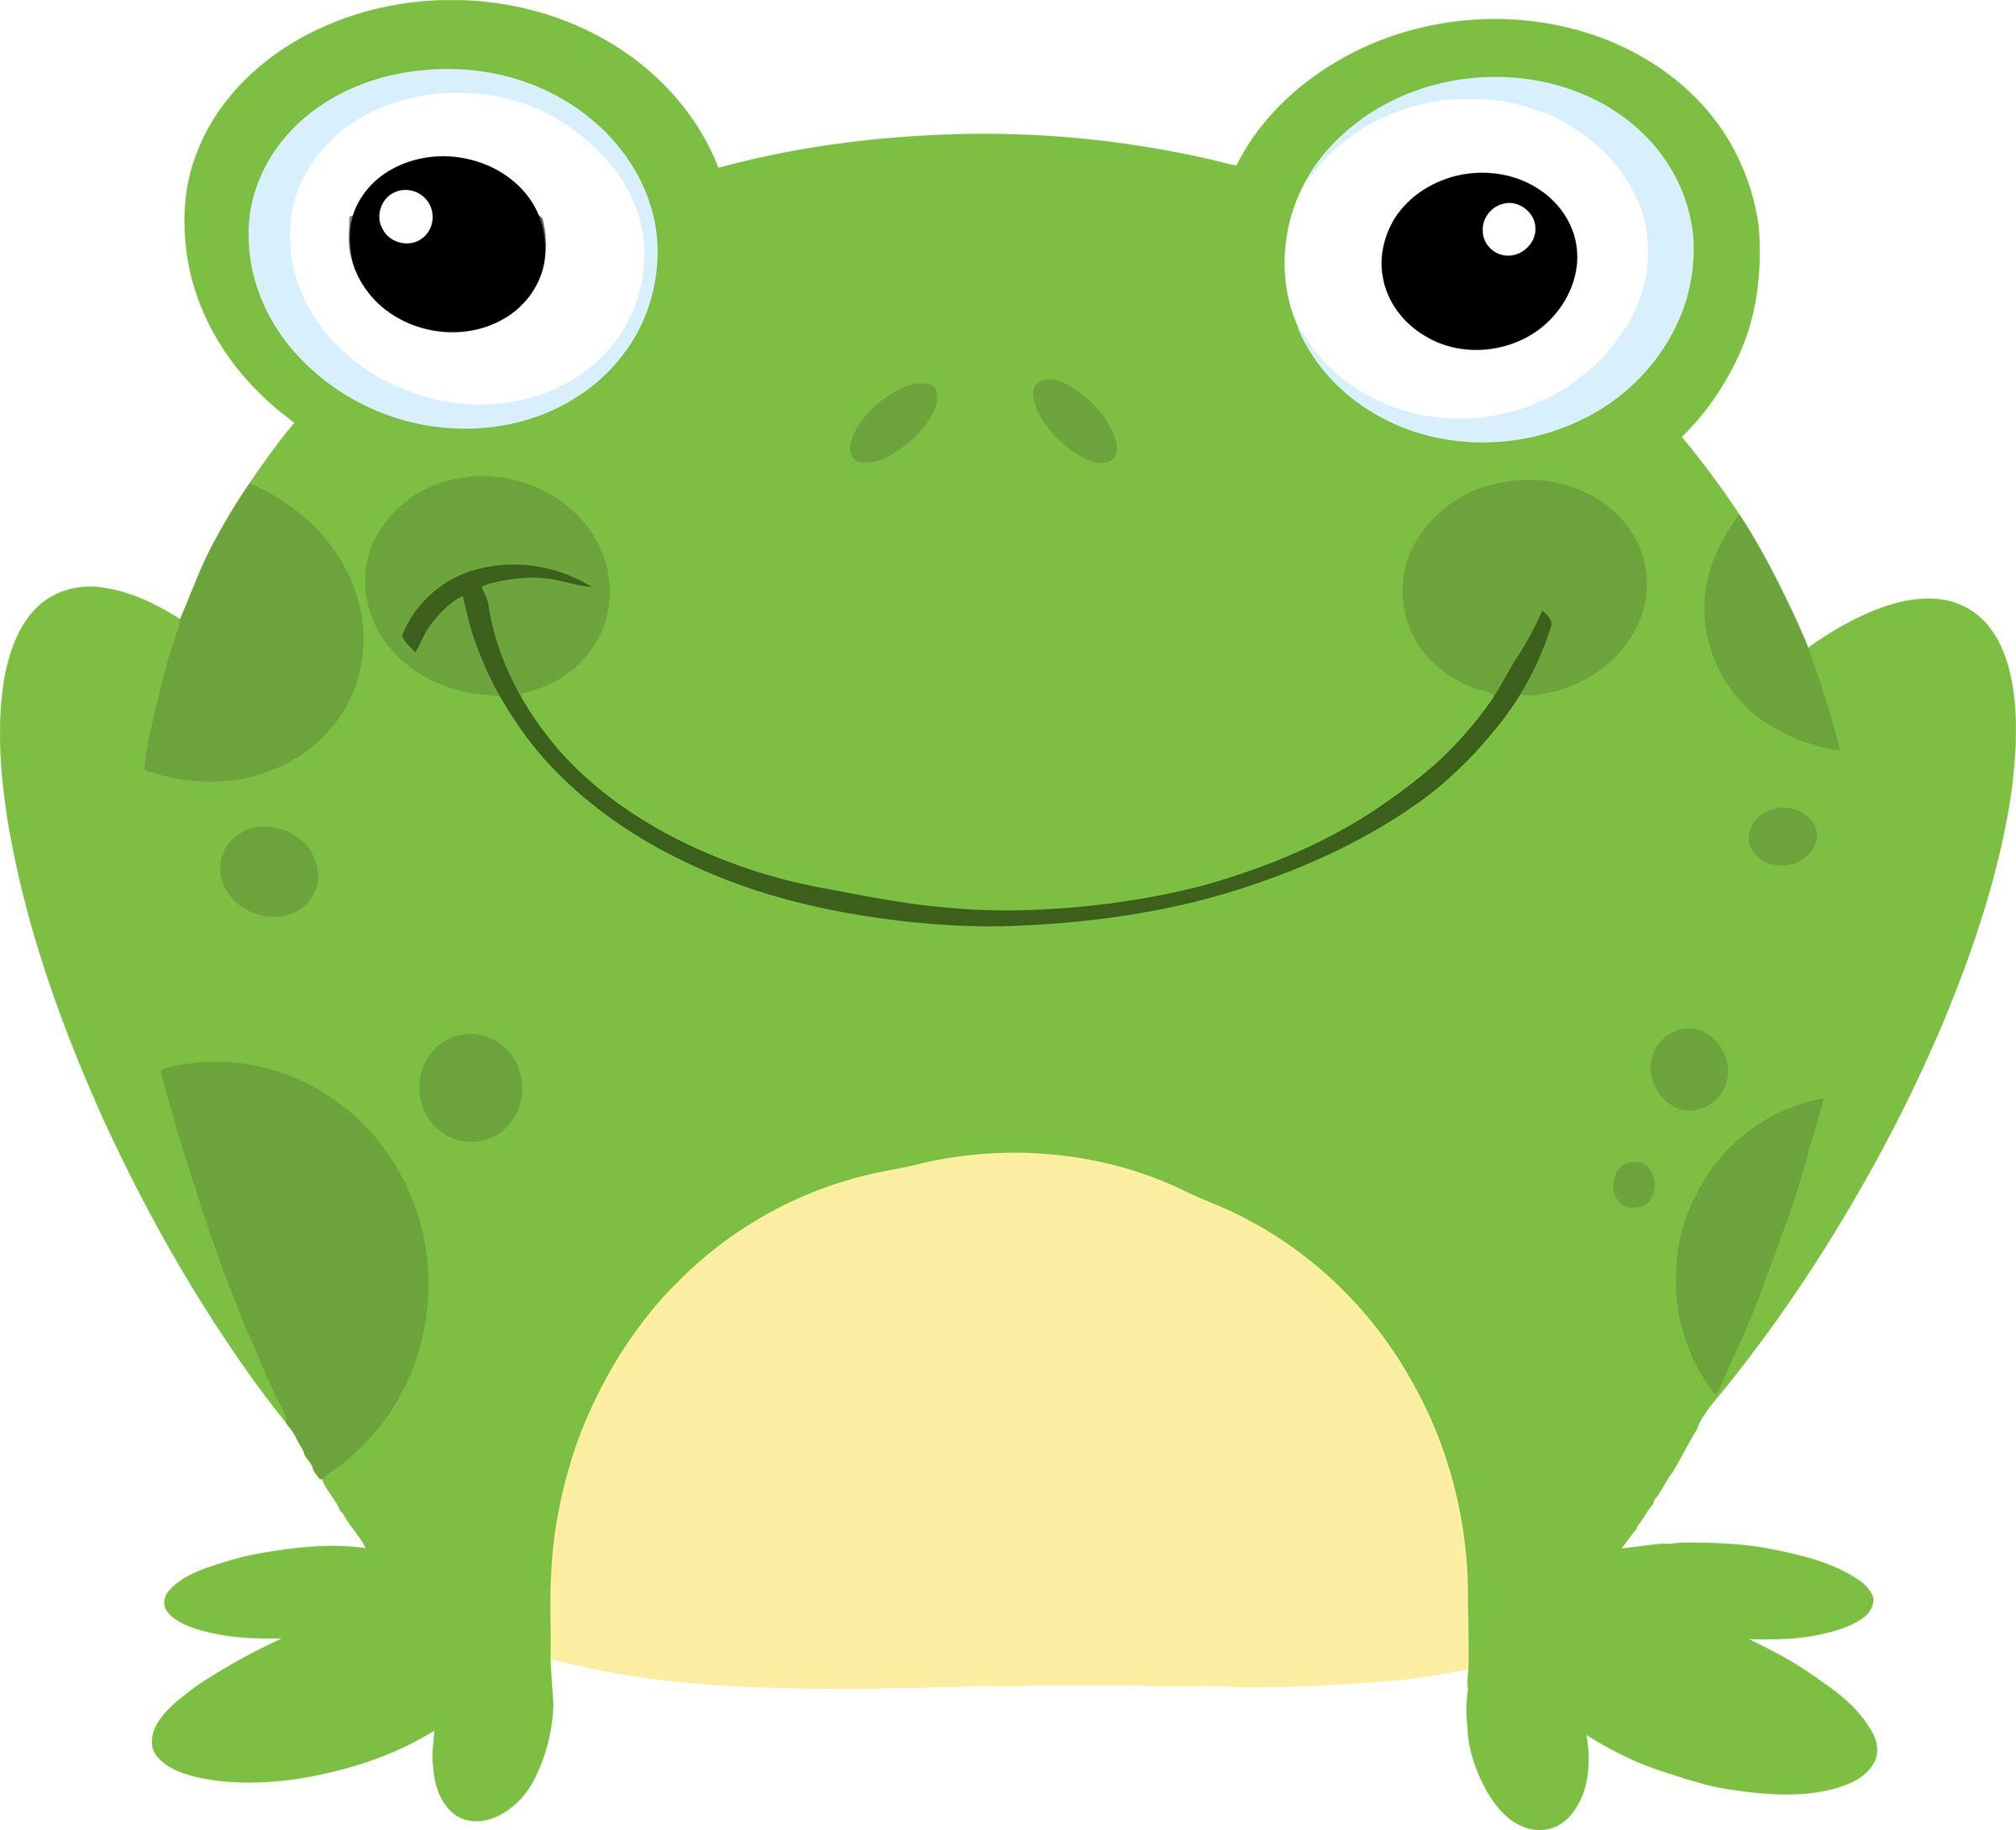 Working frog clipart vector freeuse Preschool frog clipart   School   Frog illustration, Frog pictures ... vector freeuse